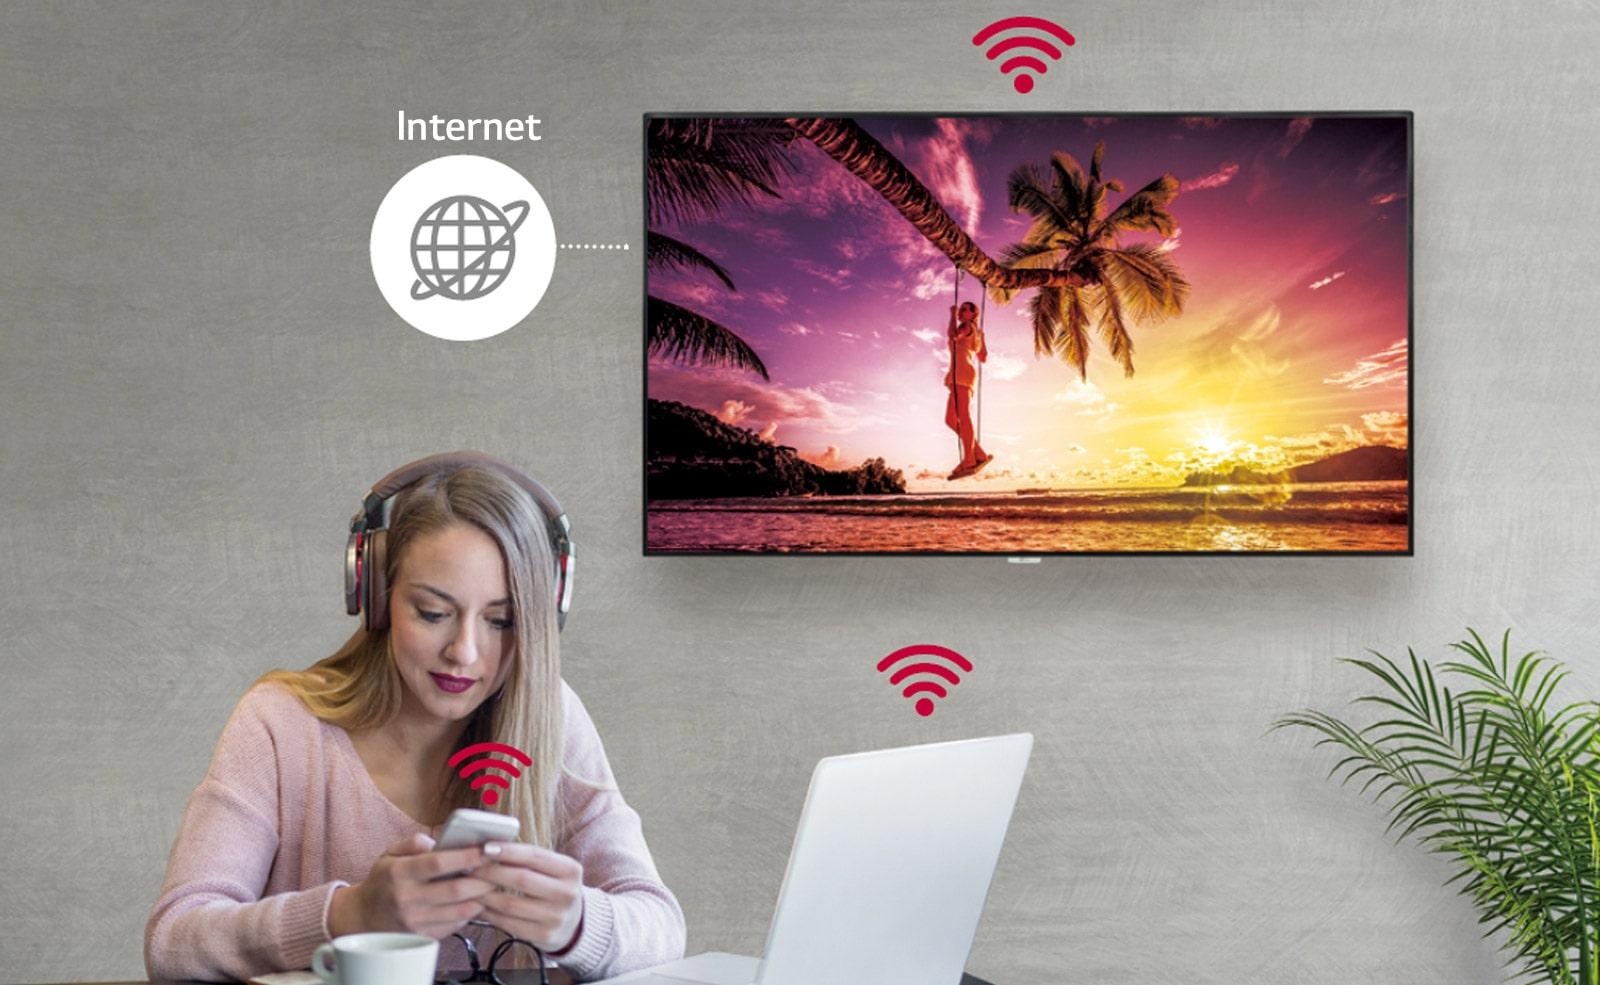 Wireless Access Point.